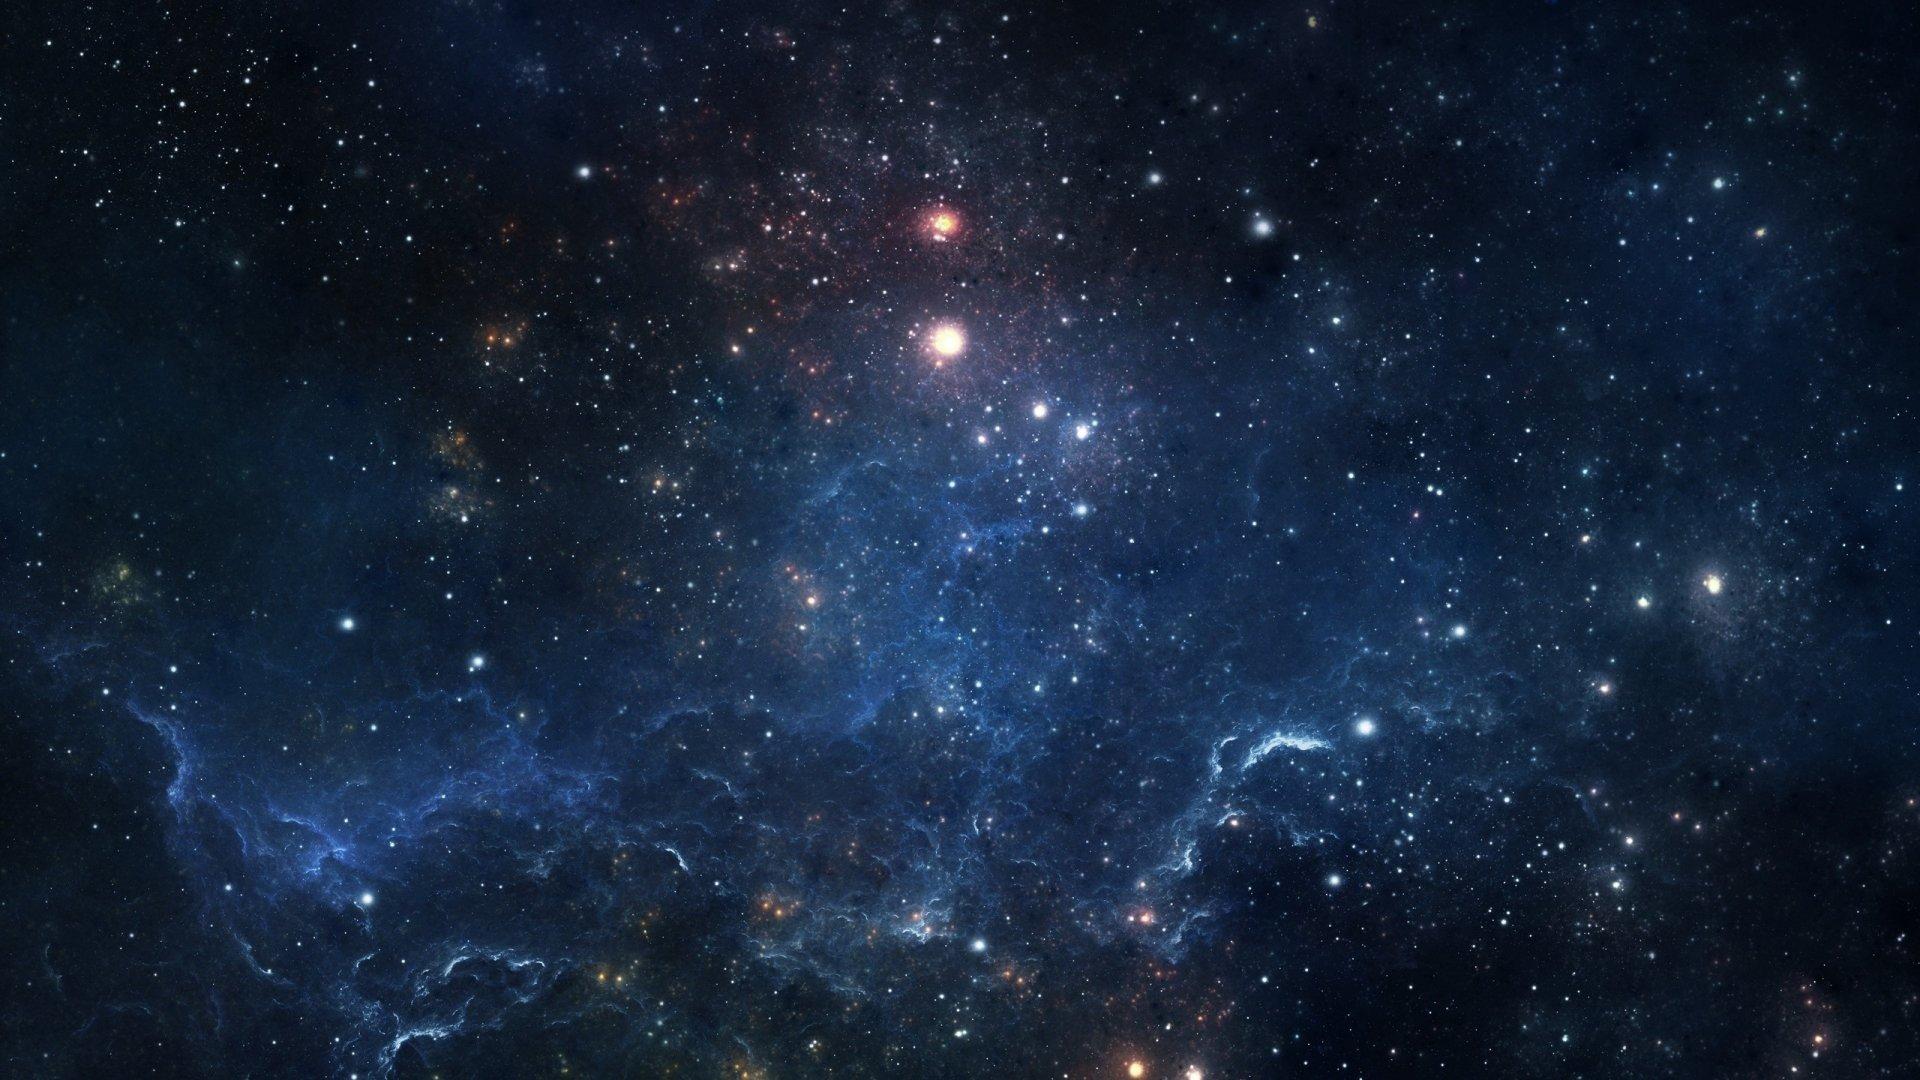 space, Stars, Nebula, Galaxy, Space art HD Wallpapers ...